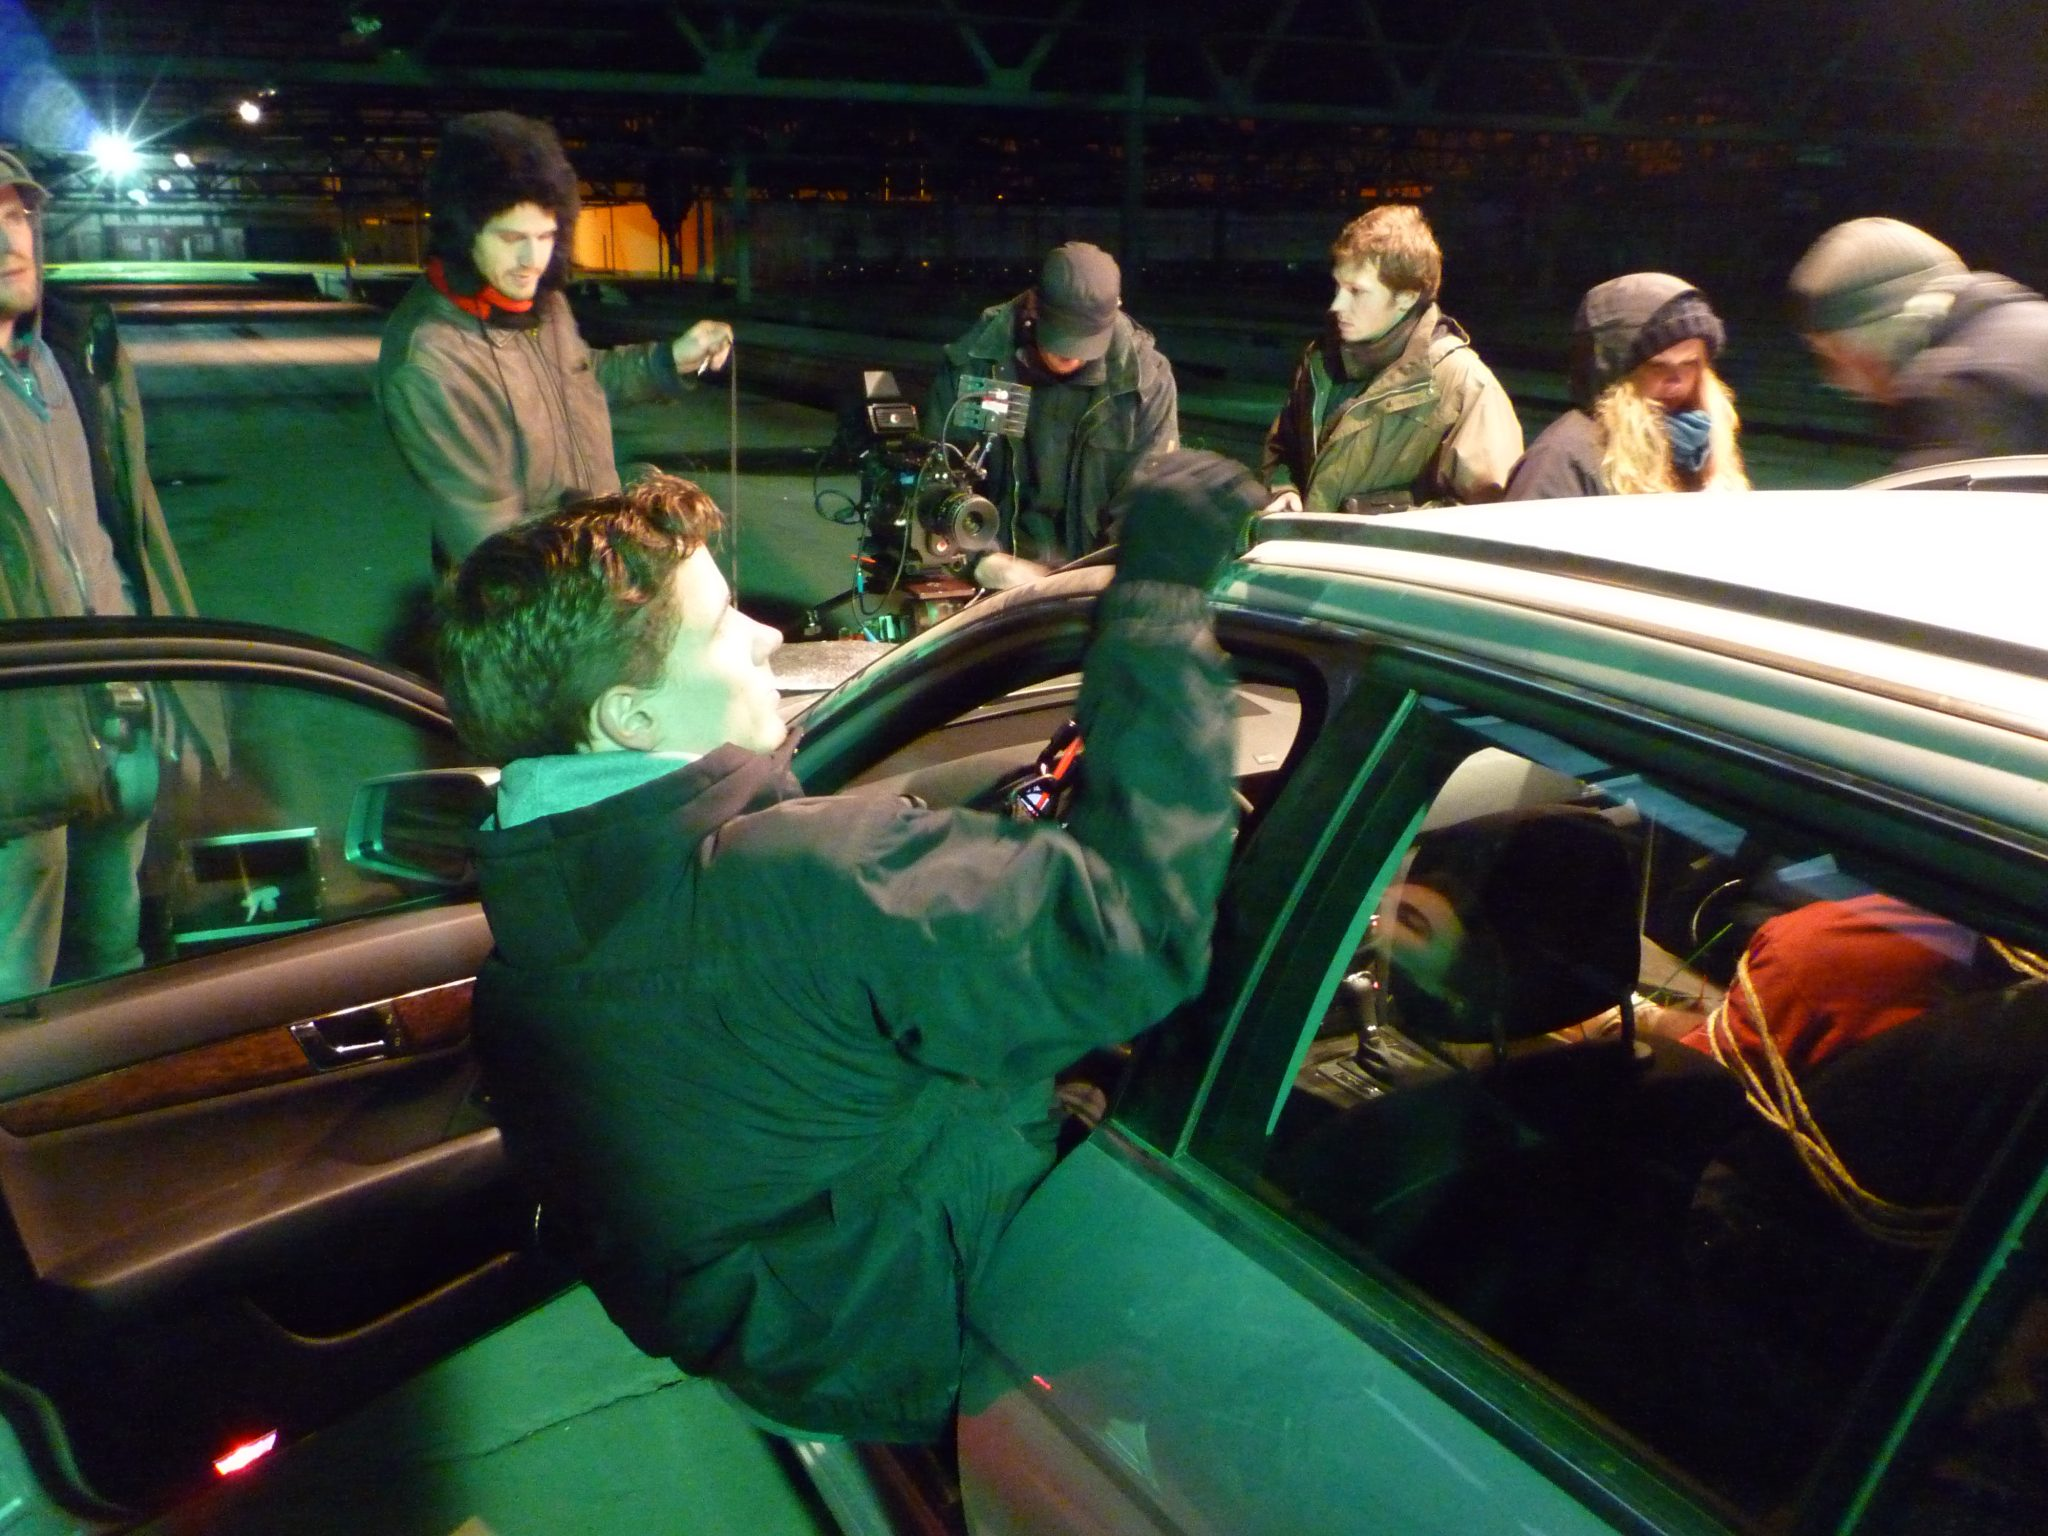 MG Action, Martin Goeres, Stuntdriving, precisiondriving